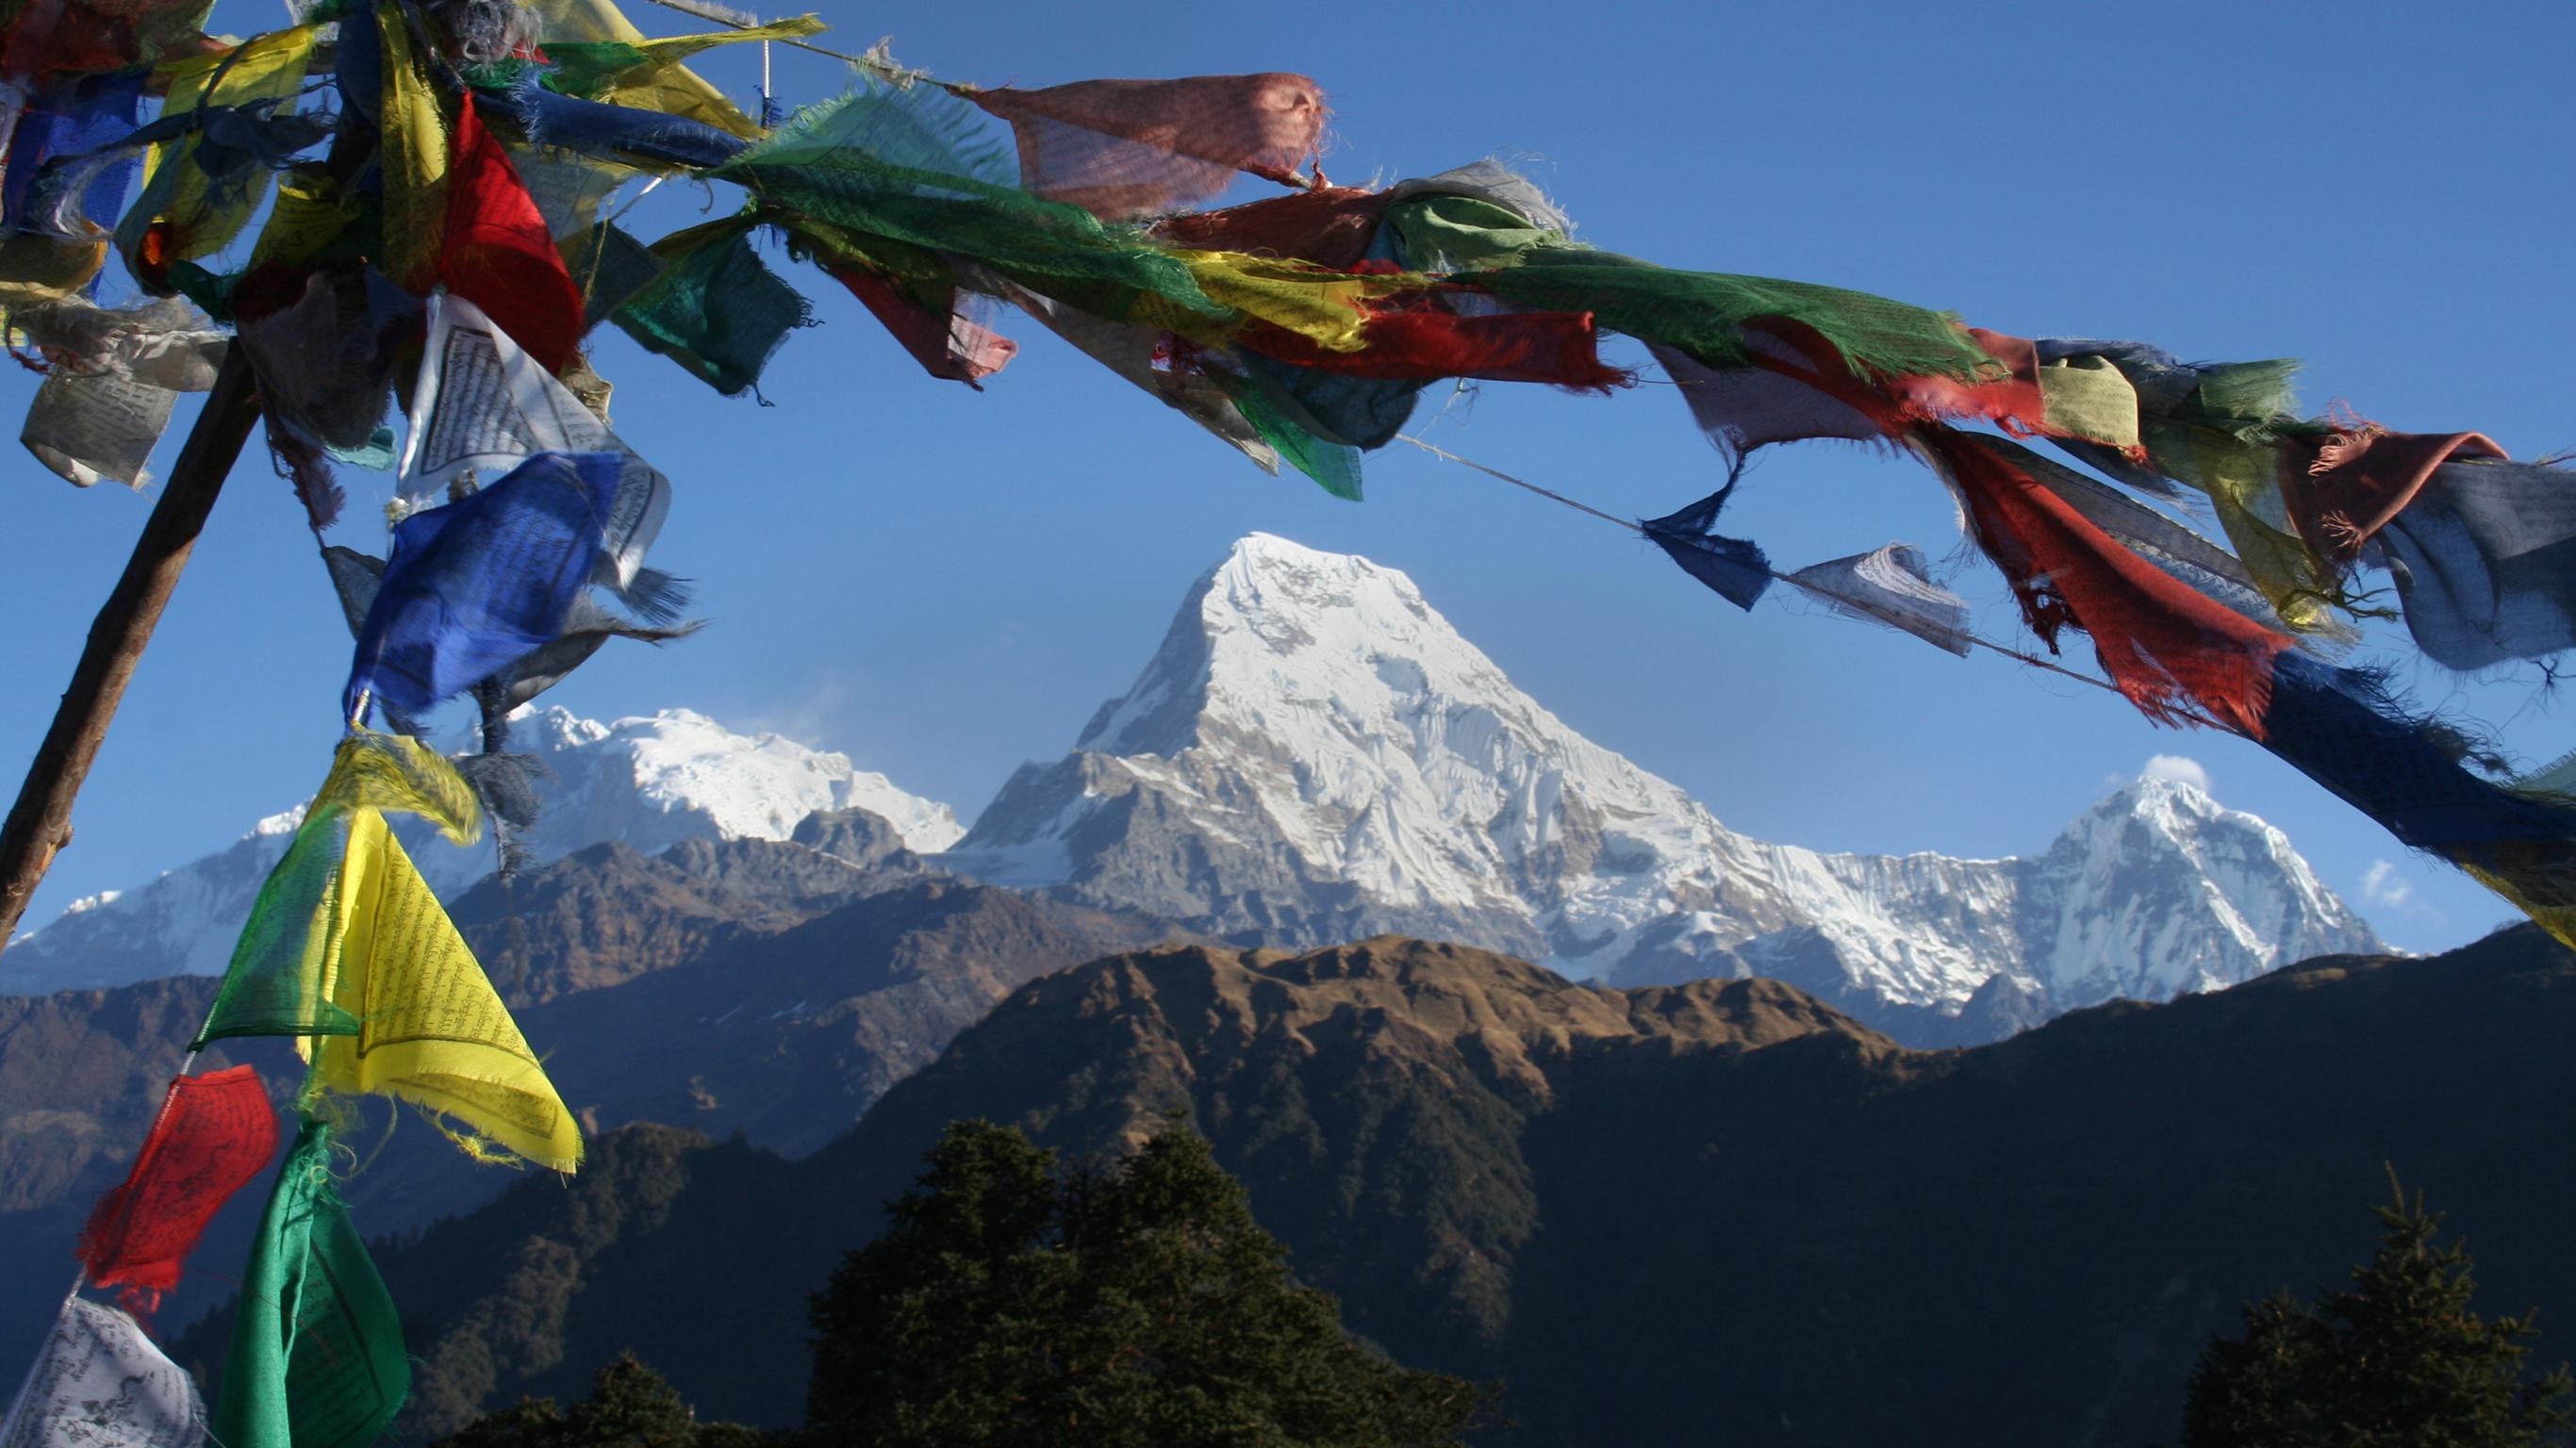 Stockists of Annapurna Sanctuary